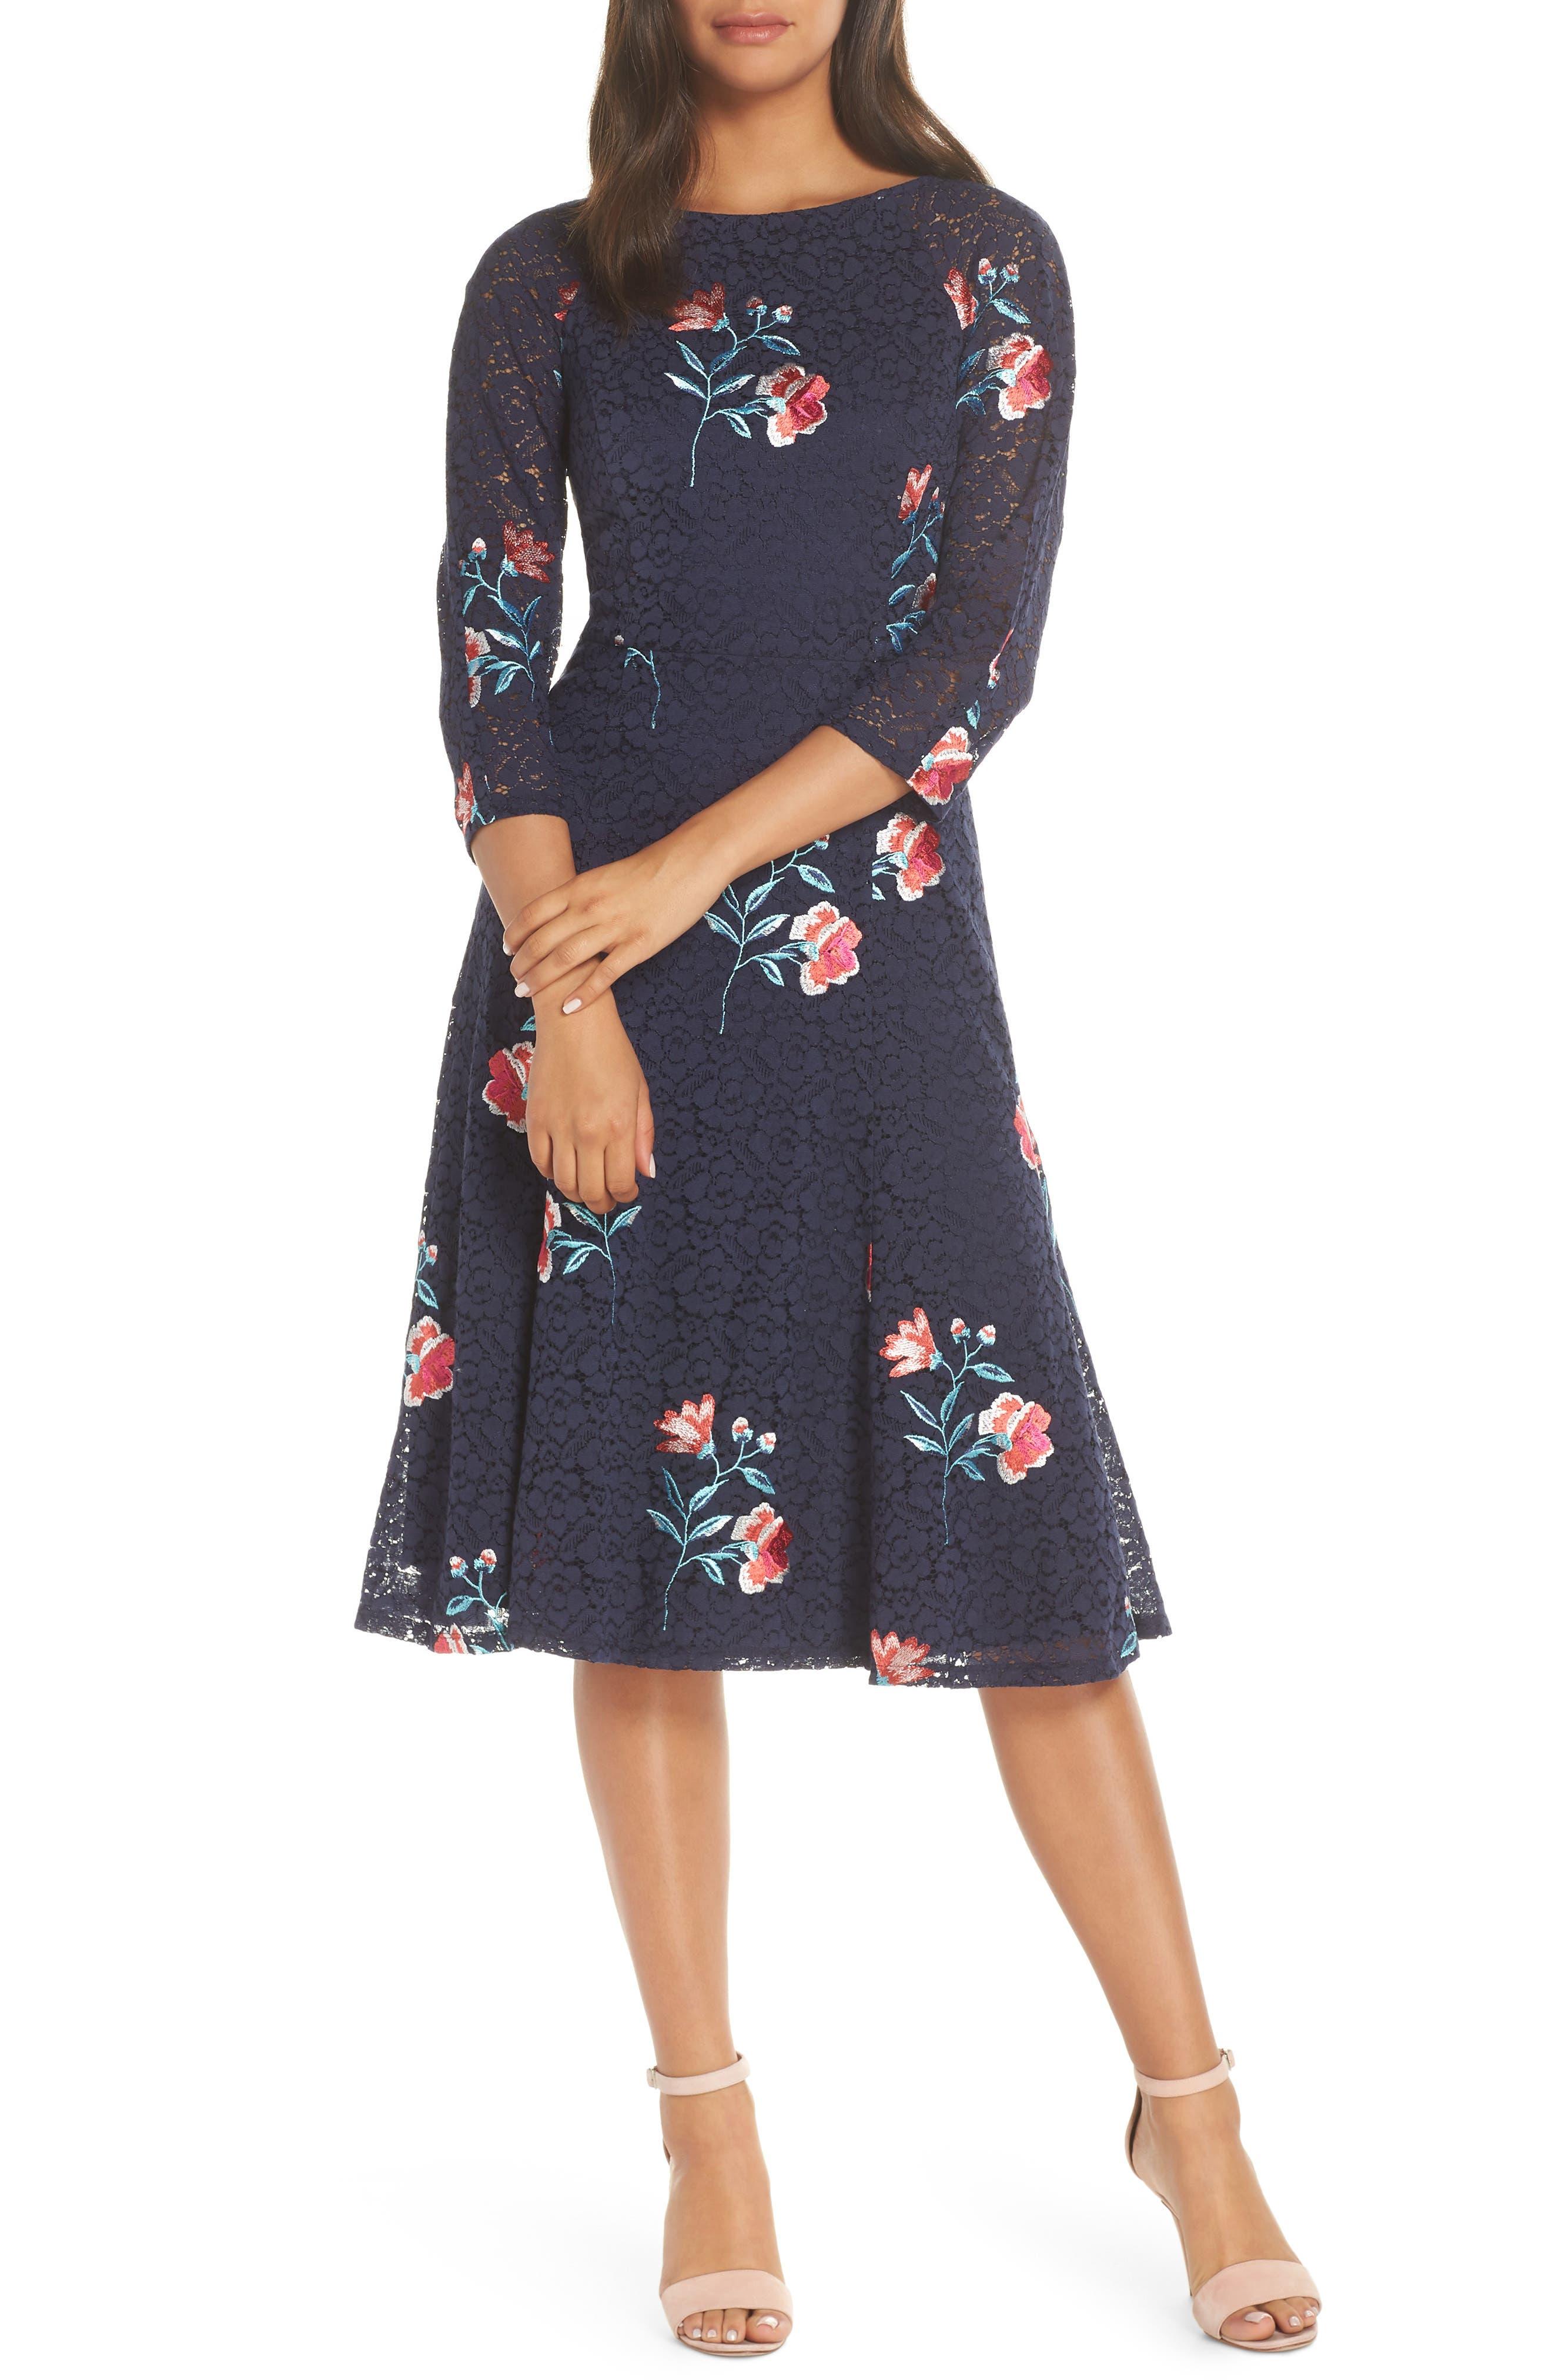 ELIZA J Embroidery & Lace A-Line Dress, Main, color, NAVY